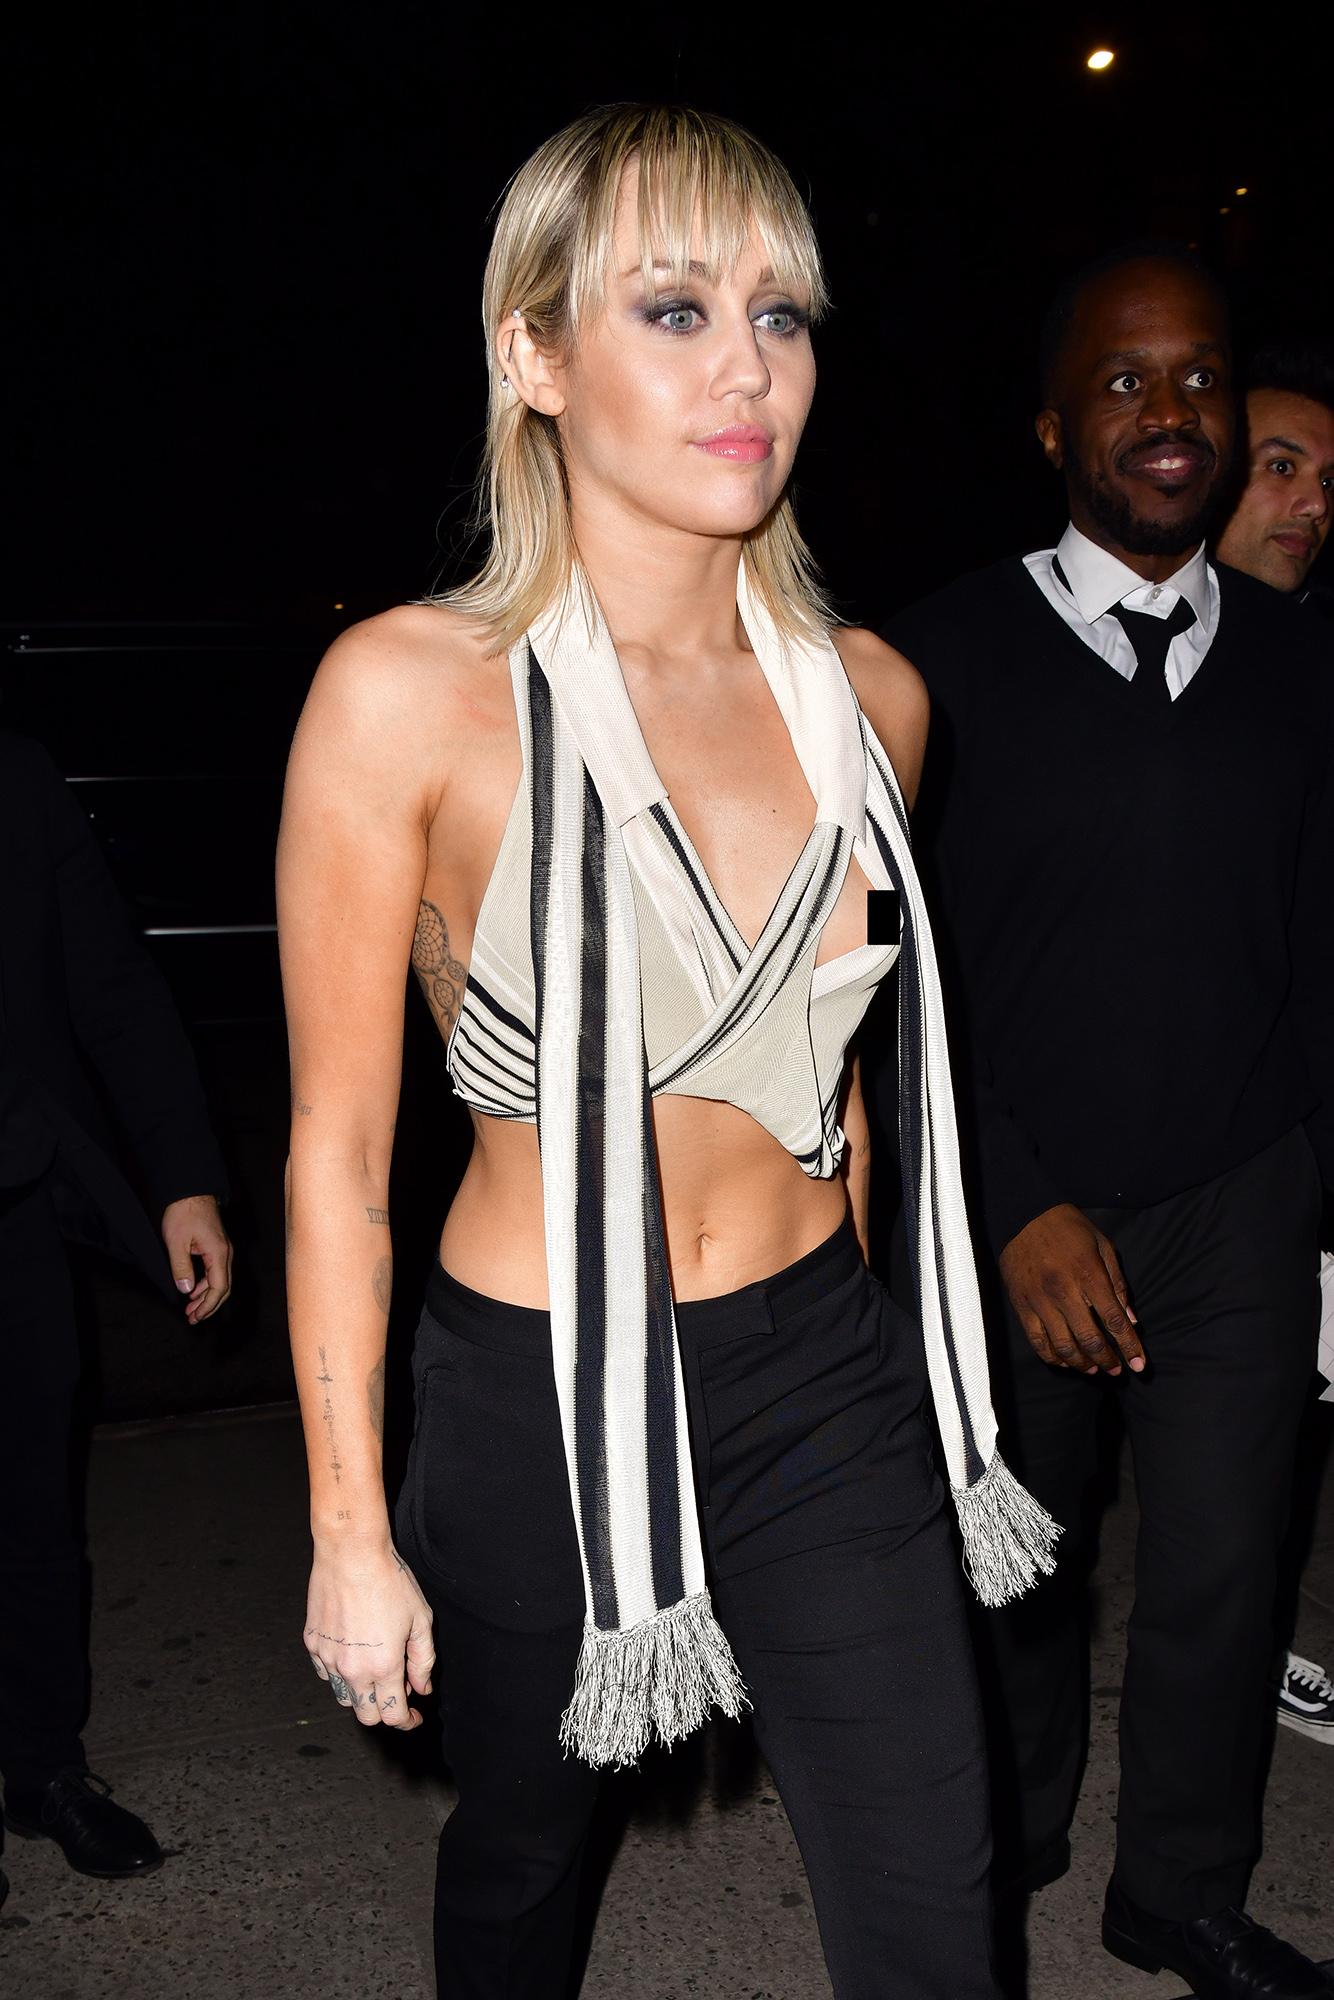 Miley Cyrus Nip Slip Video photo 20